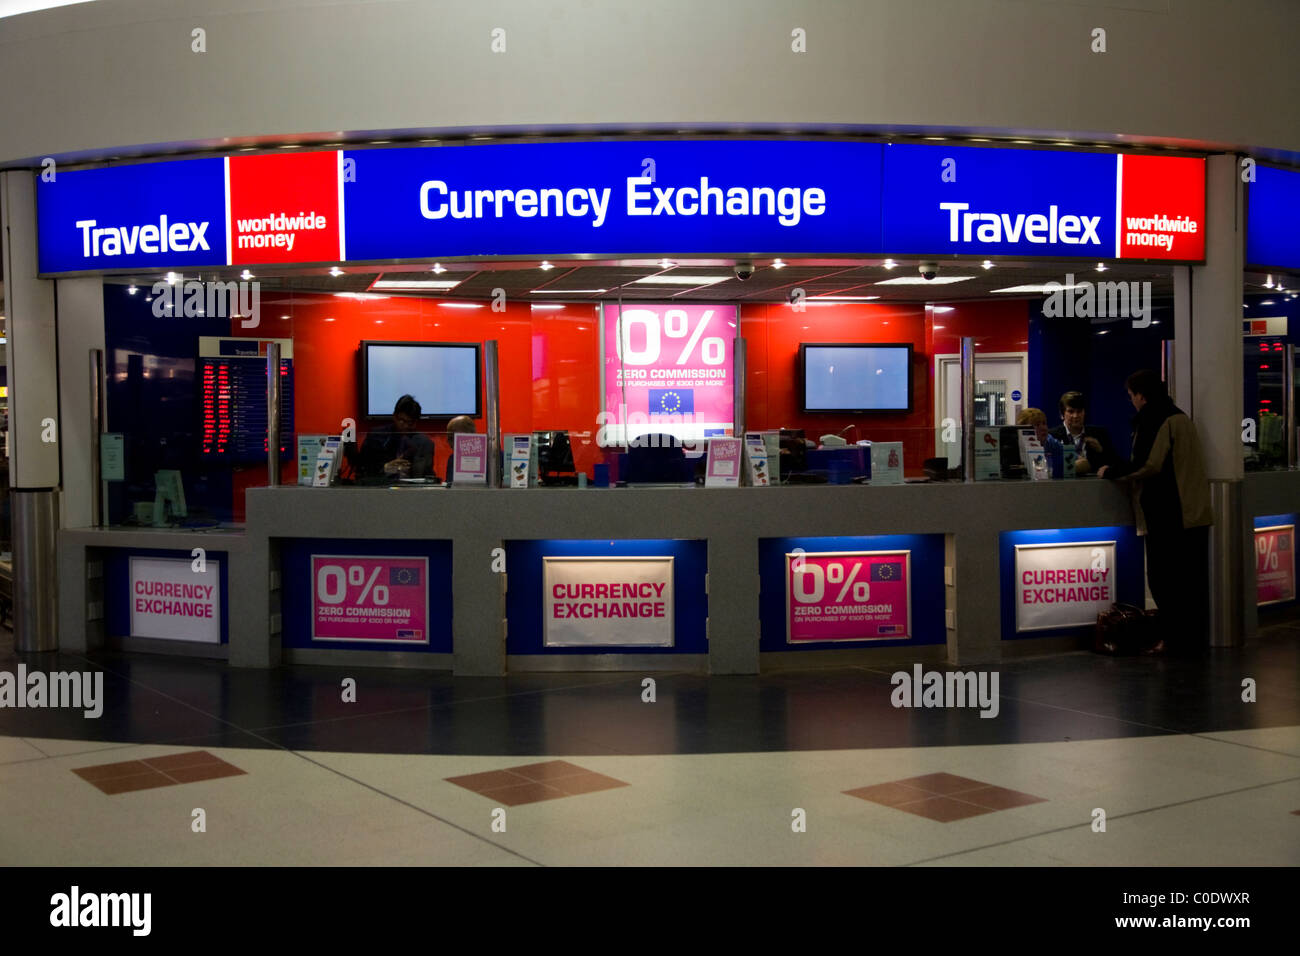 Bureau de change office operated by travelex at gatwick airport stock photo 34726463 alamy - Bureau de change marbeuf ...